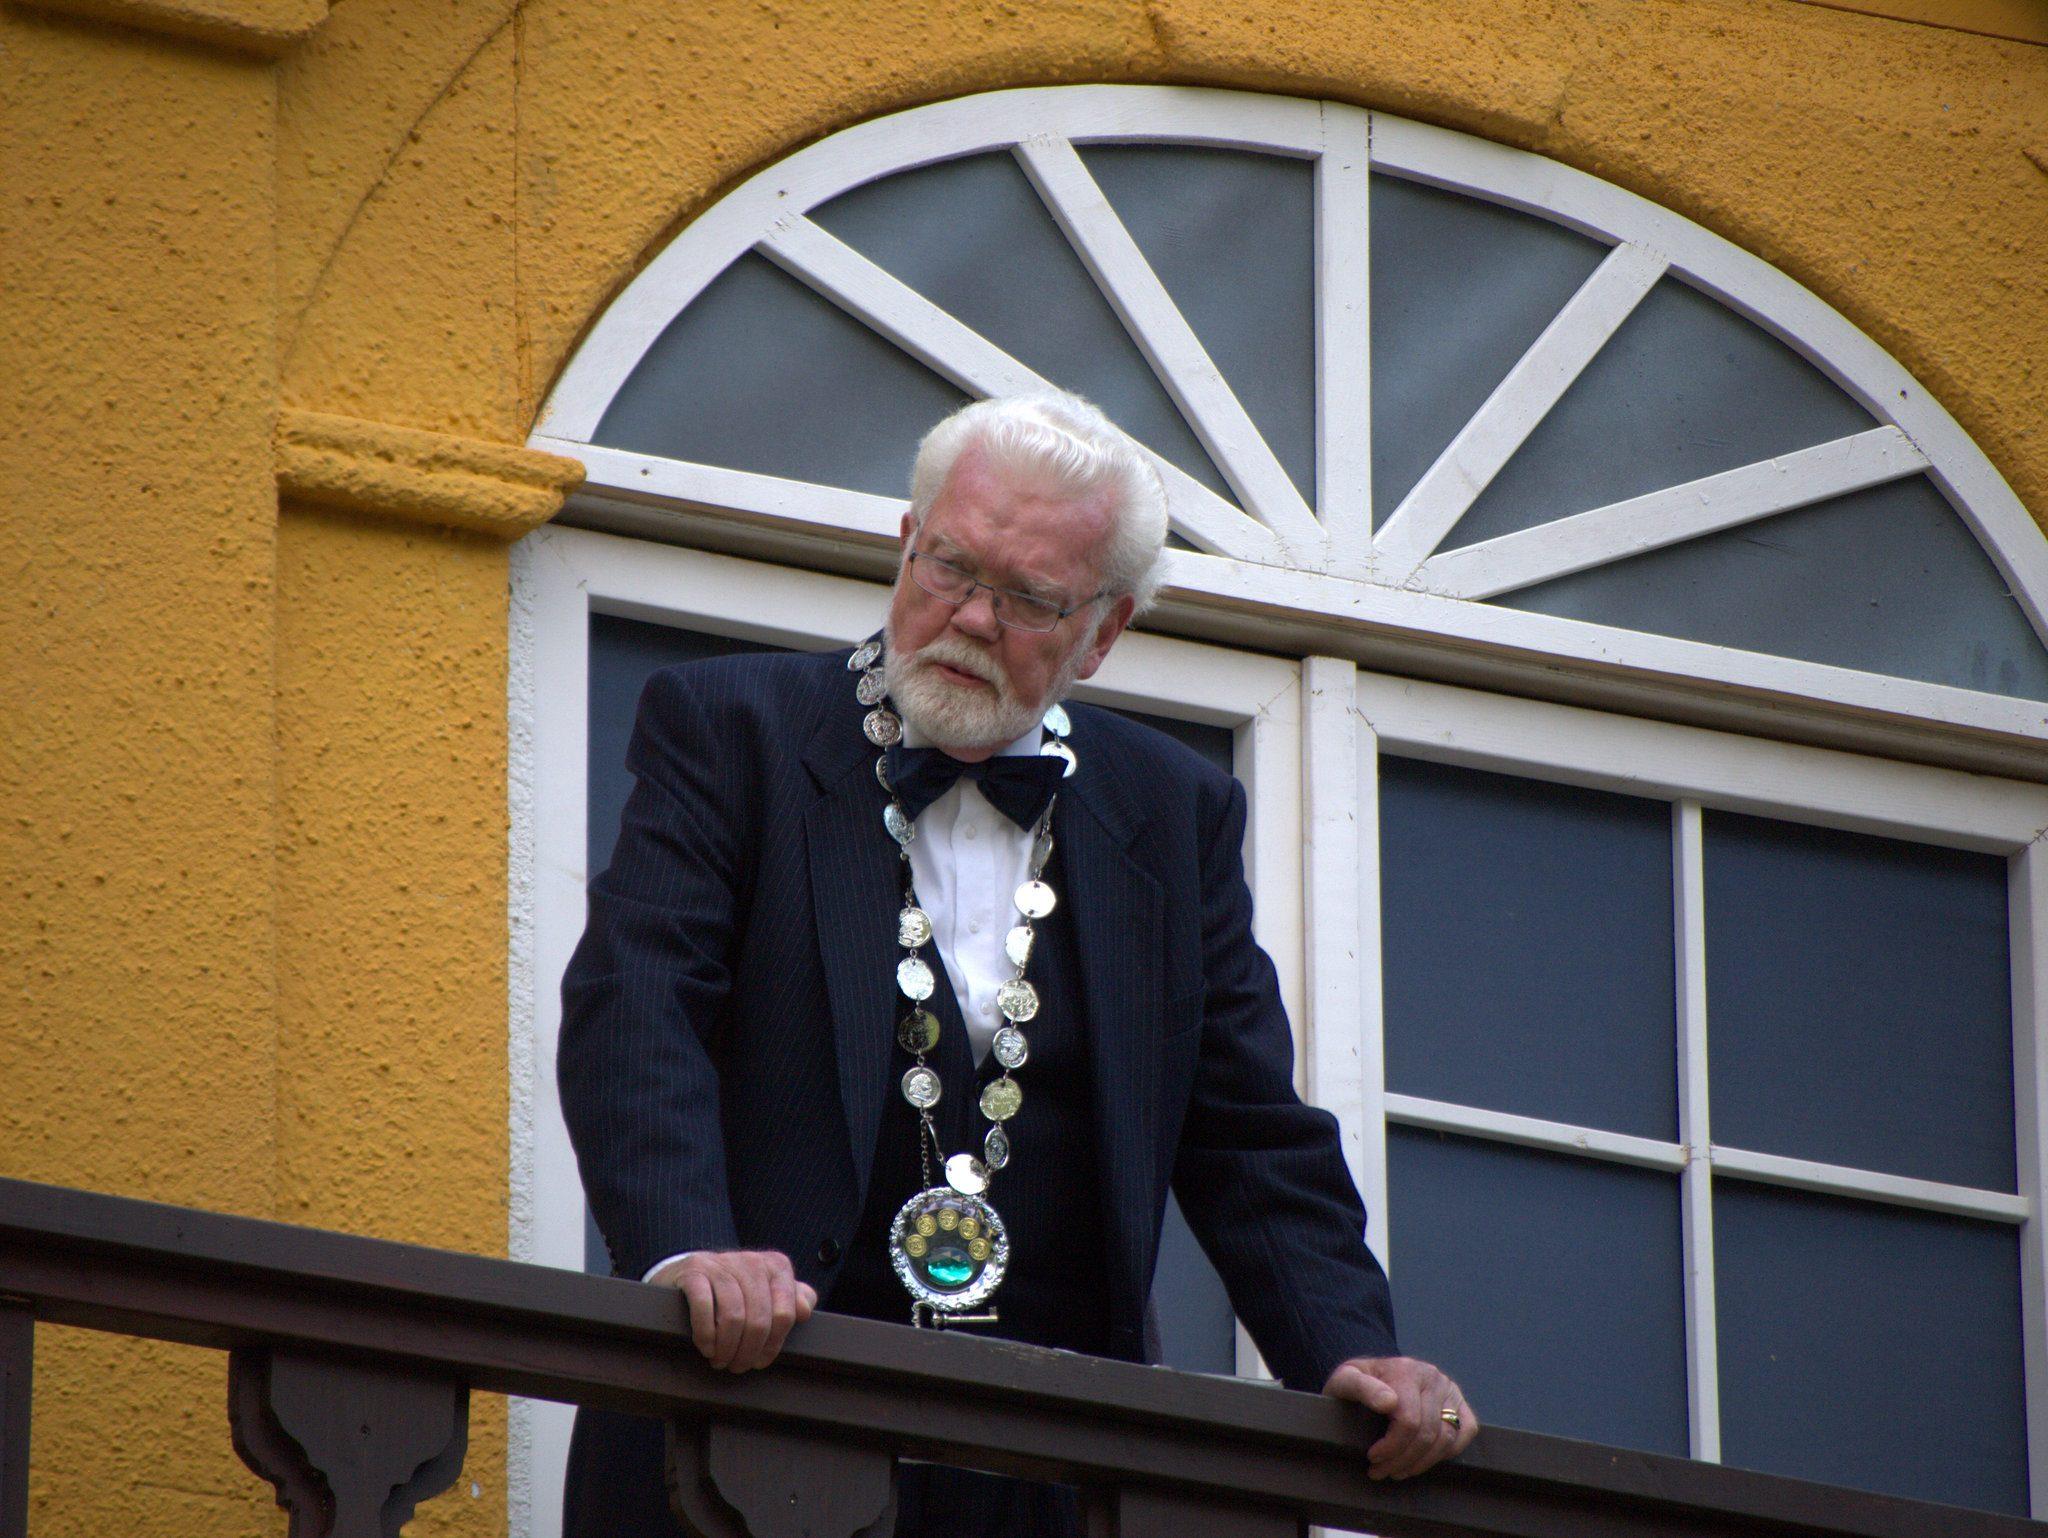 Der Bürgermeister eröffnet vom Balkon.